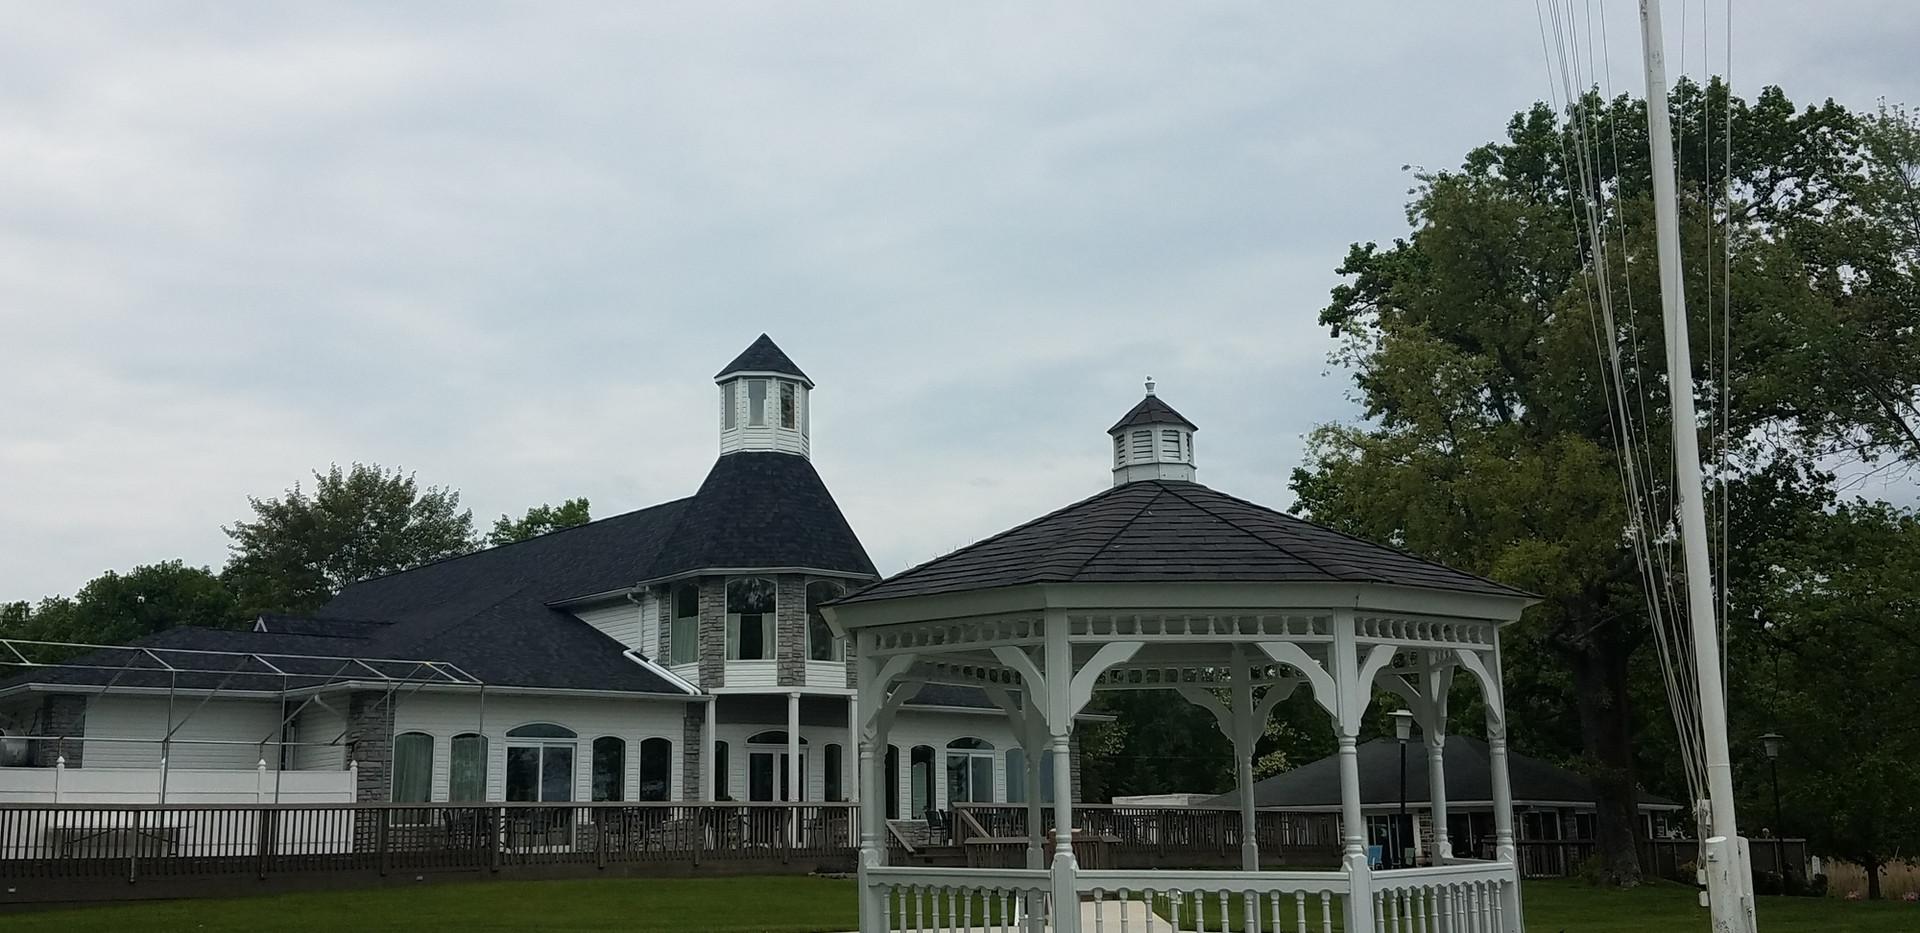 Big House, Gazebo, Flag Pole